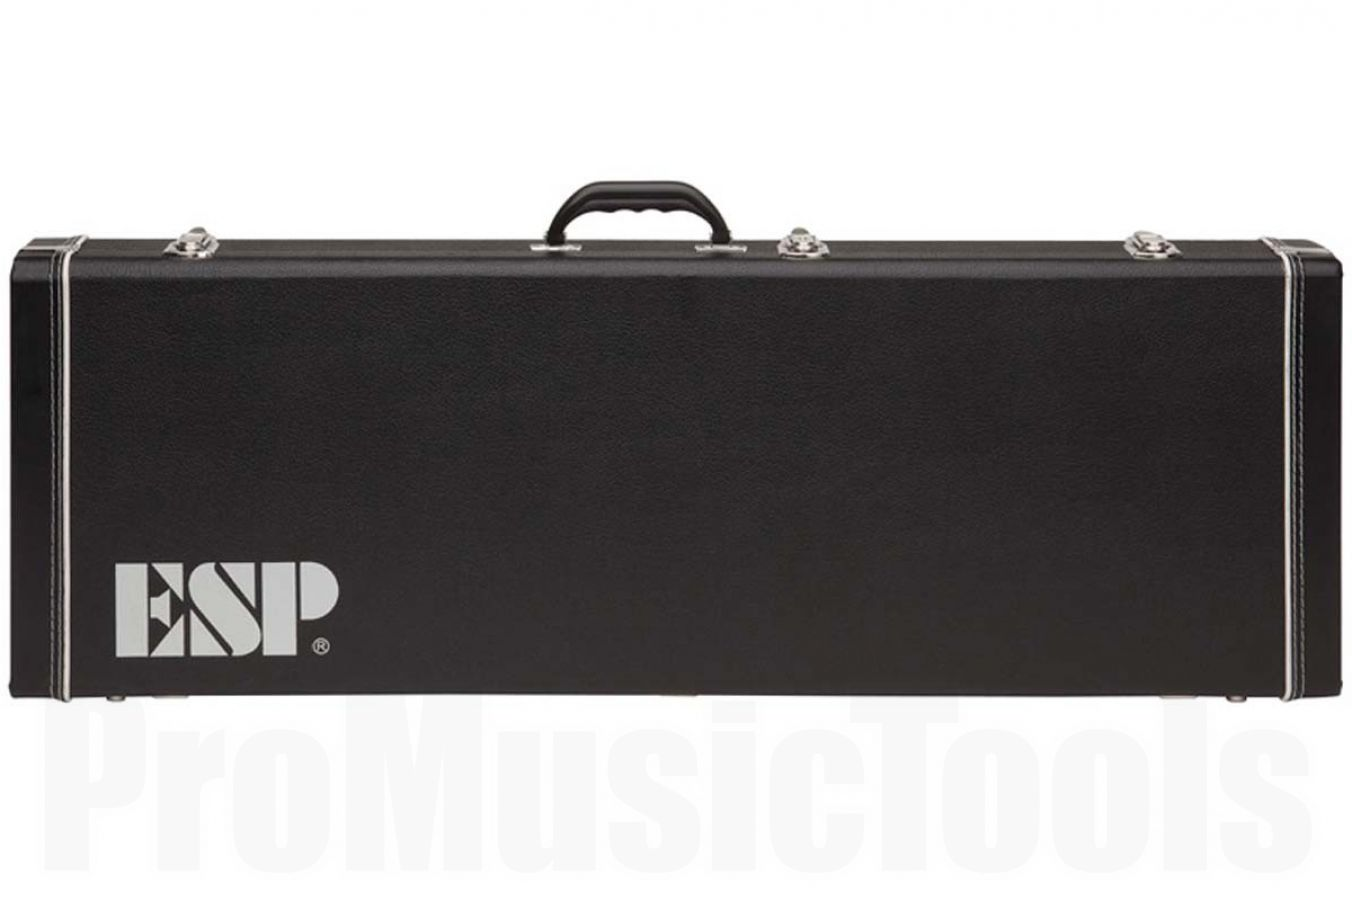 ESP Ltd V Series guitar hardcase